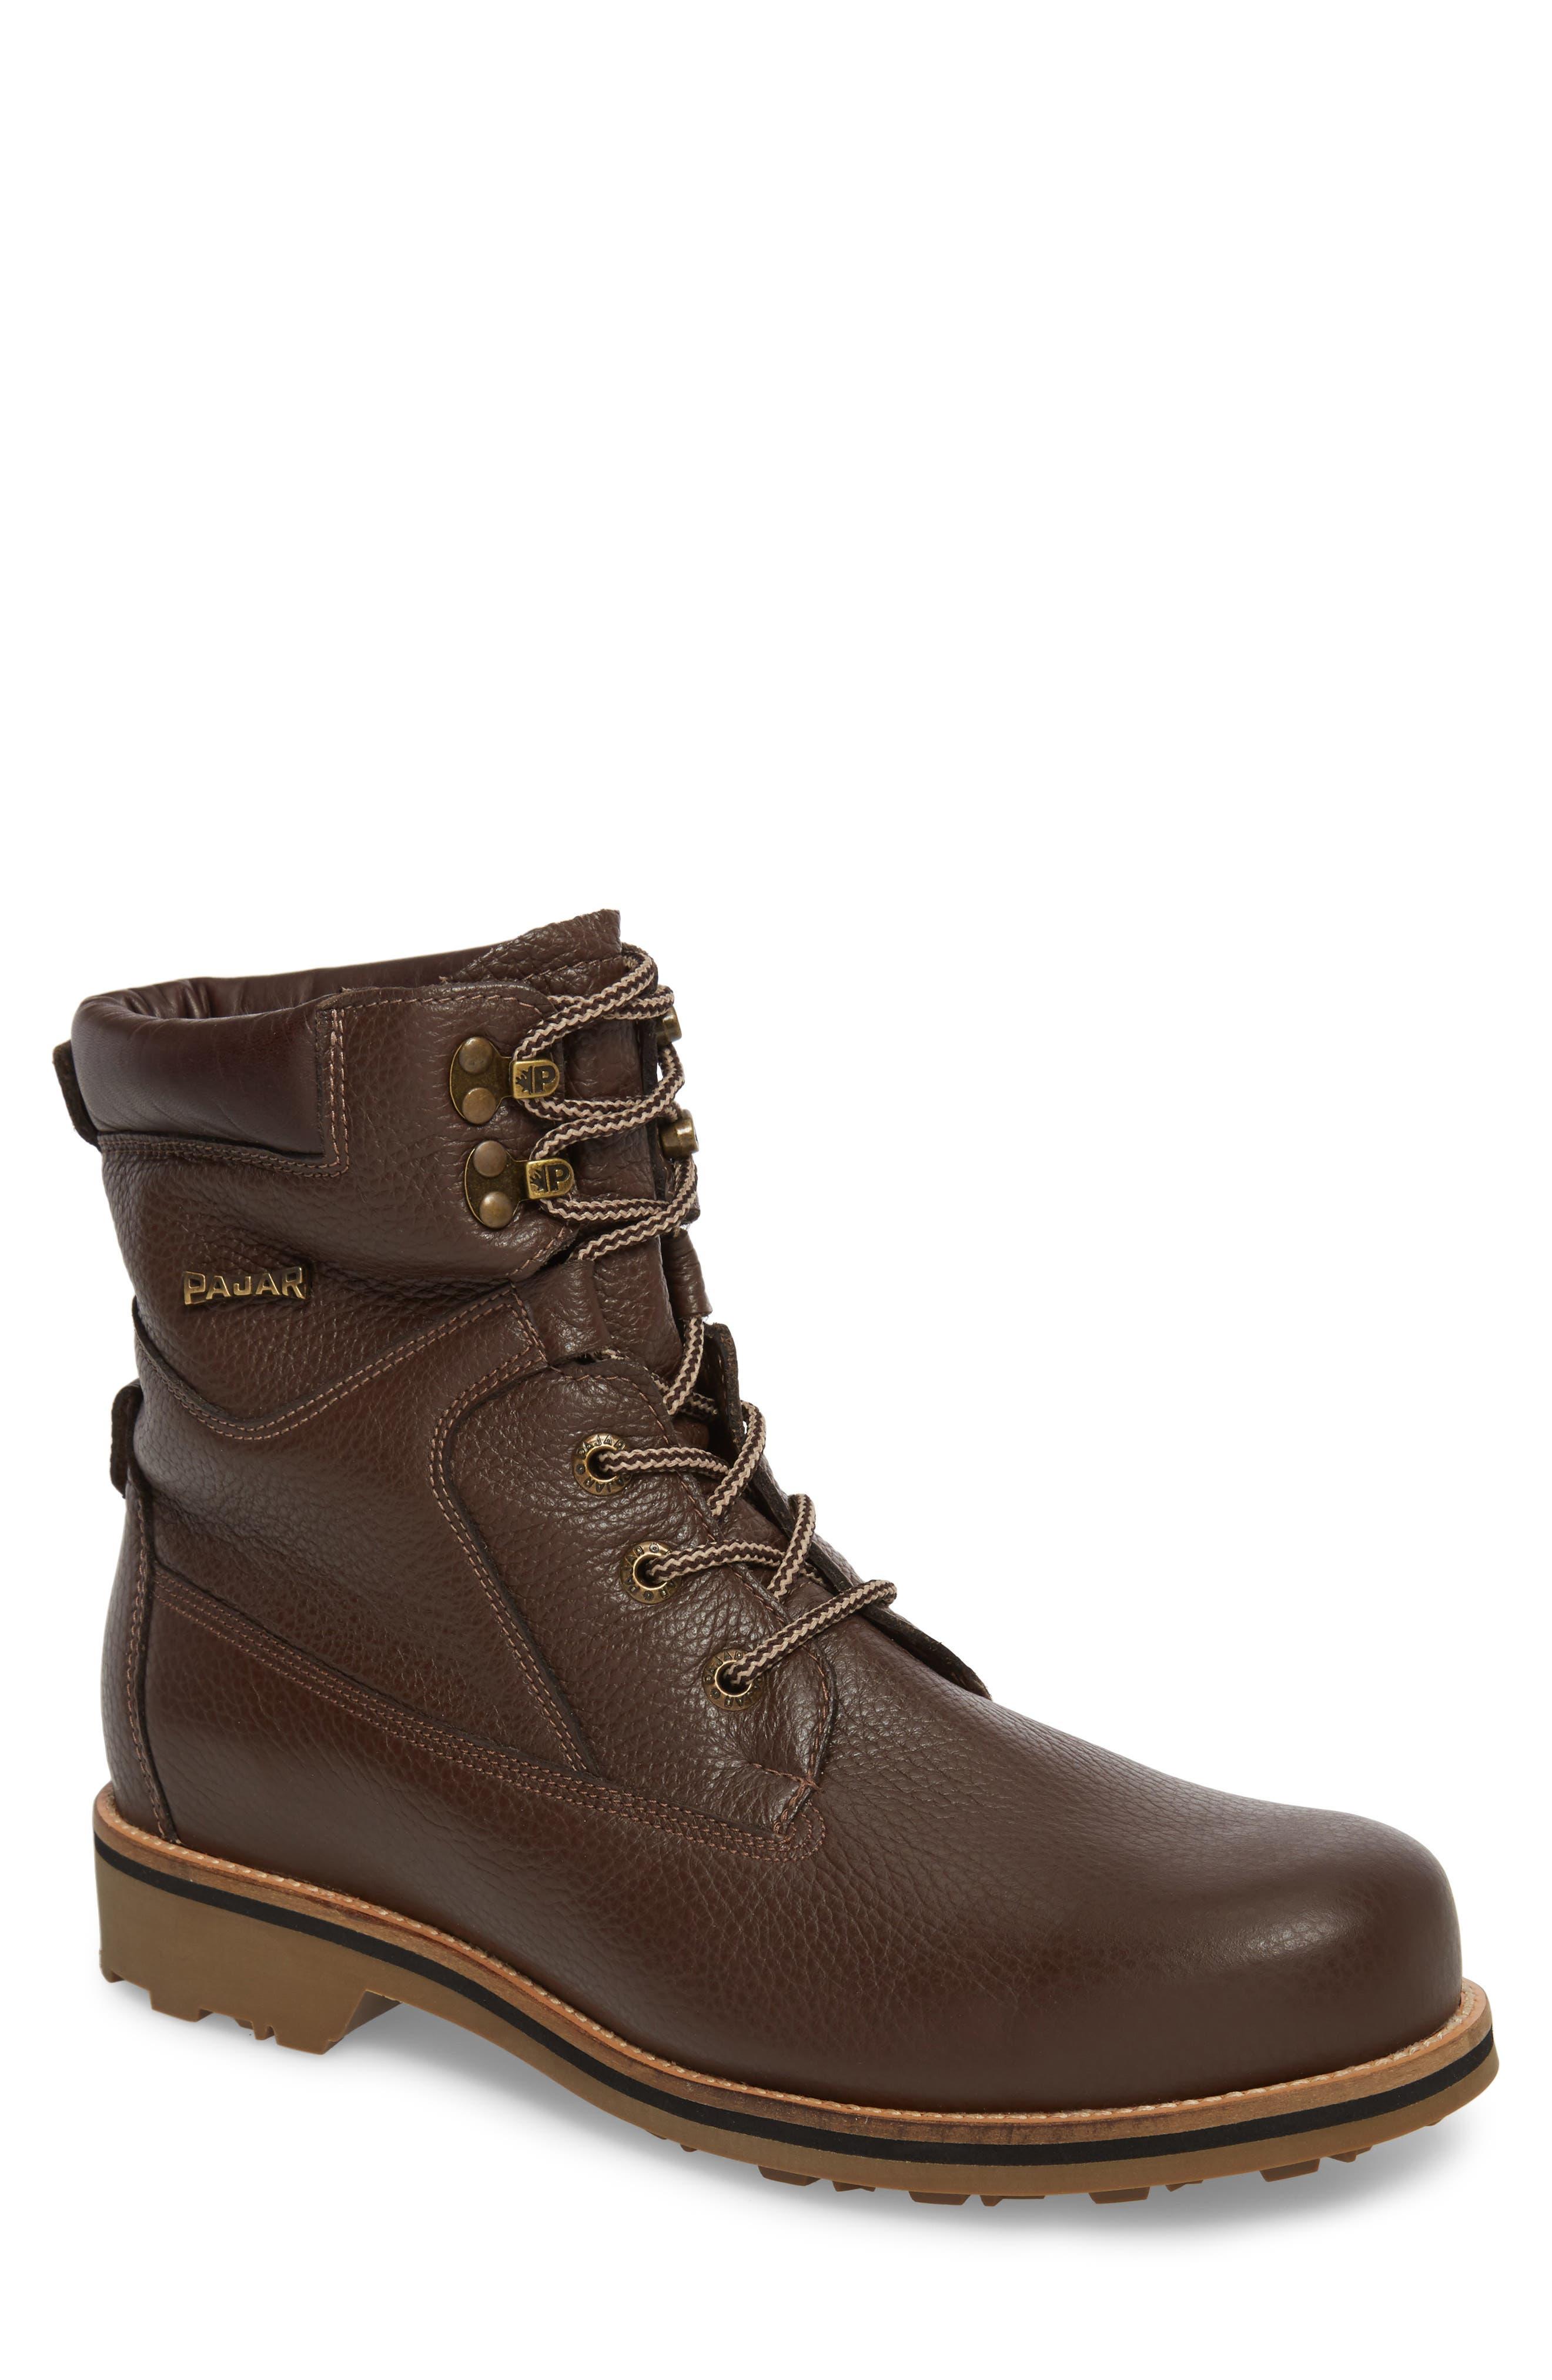 David Plain Toe Boot,                             Main thumbnail 1, color,                             Chocolate Leather